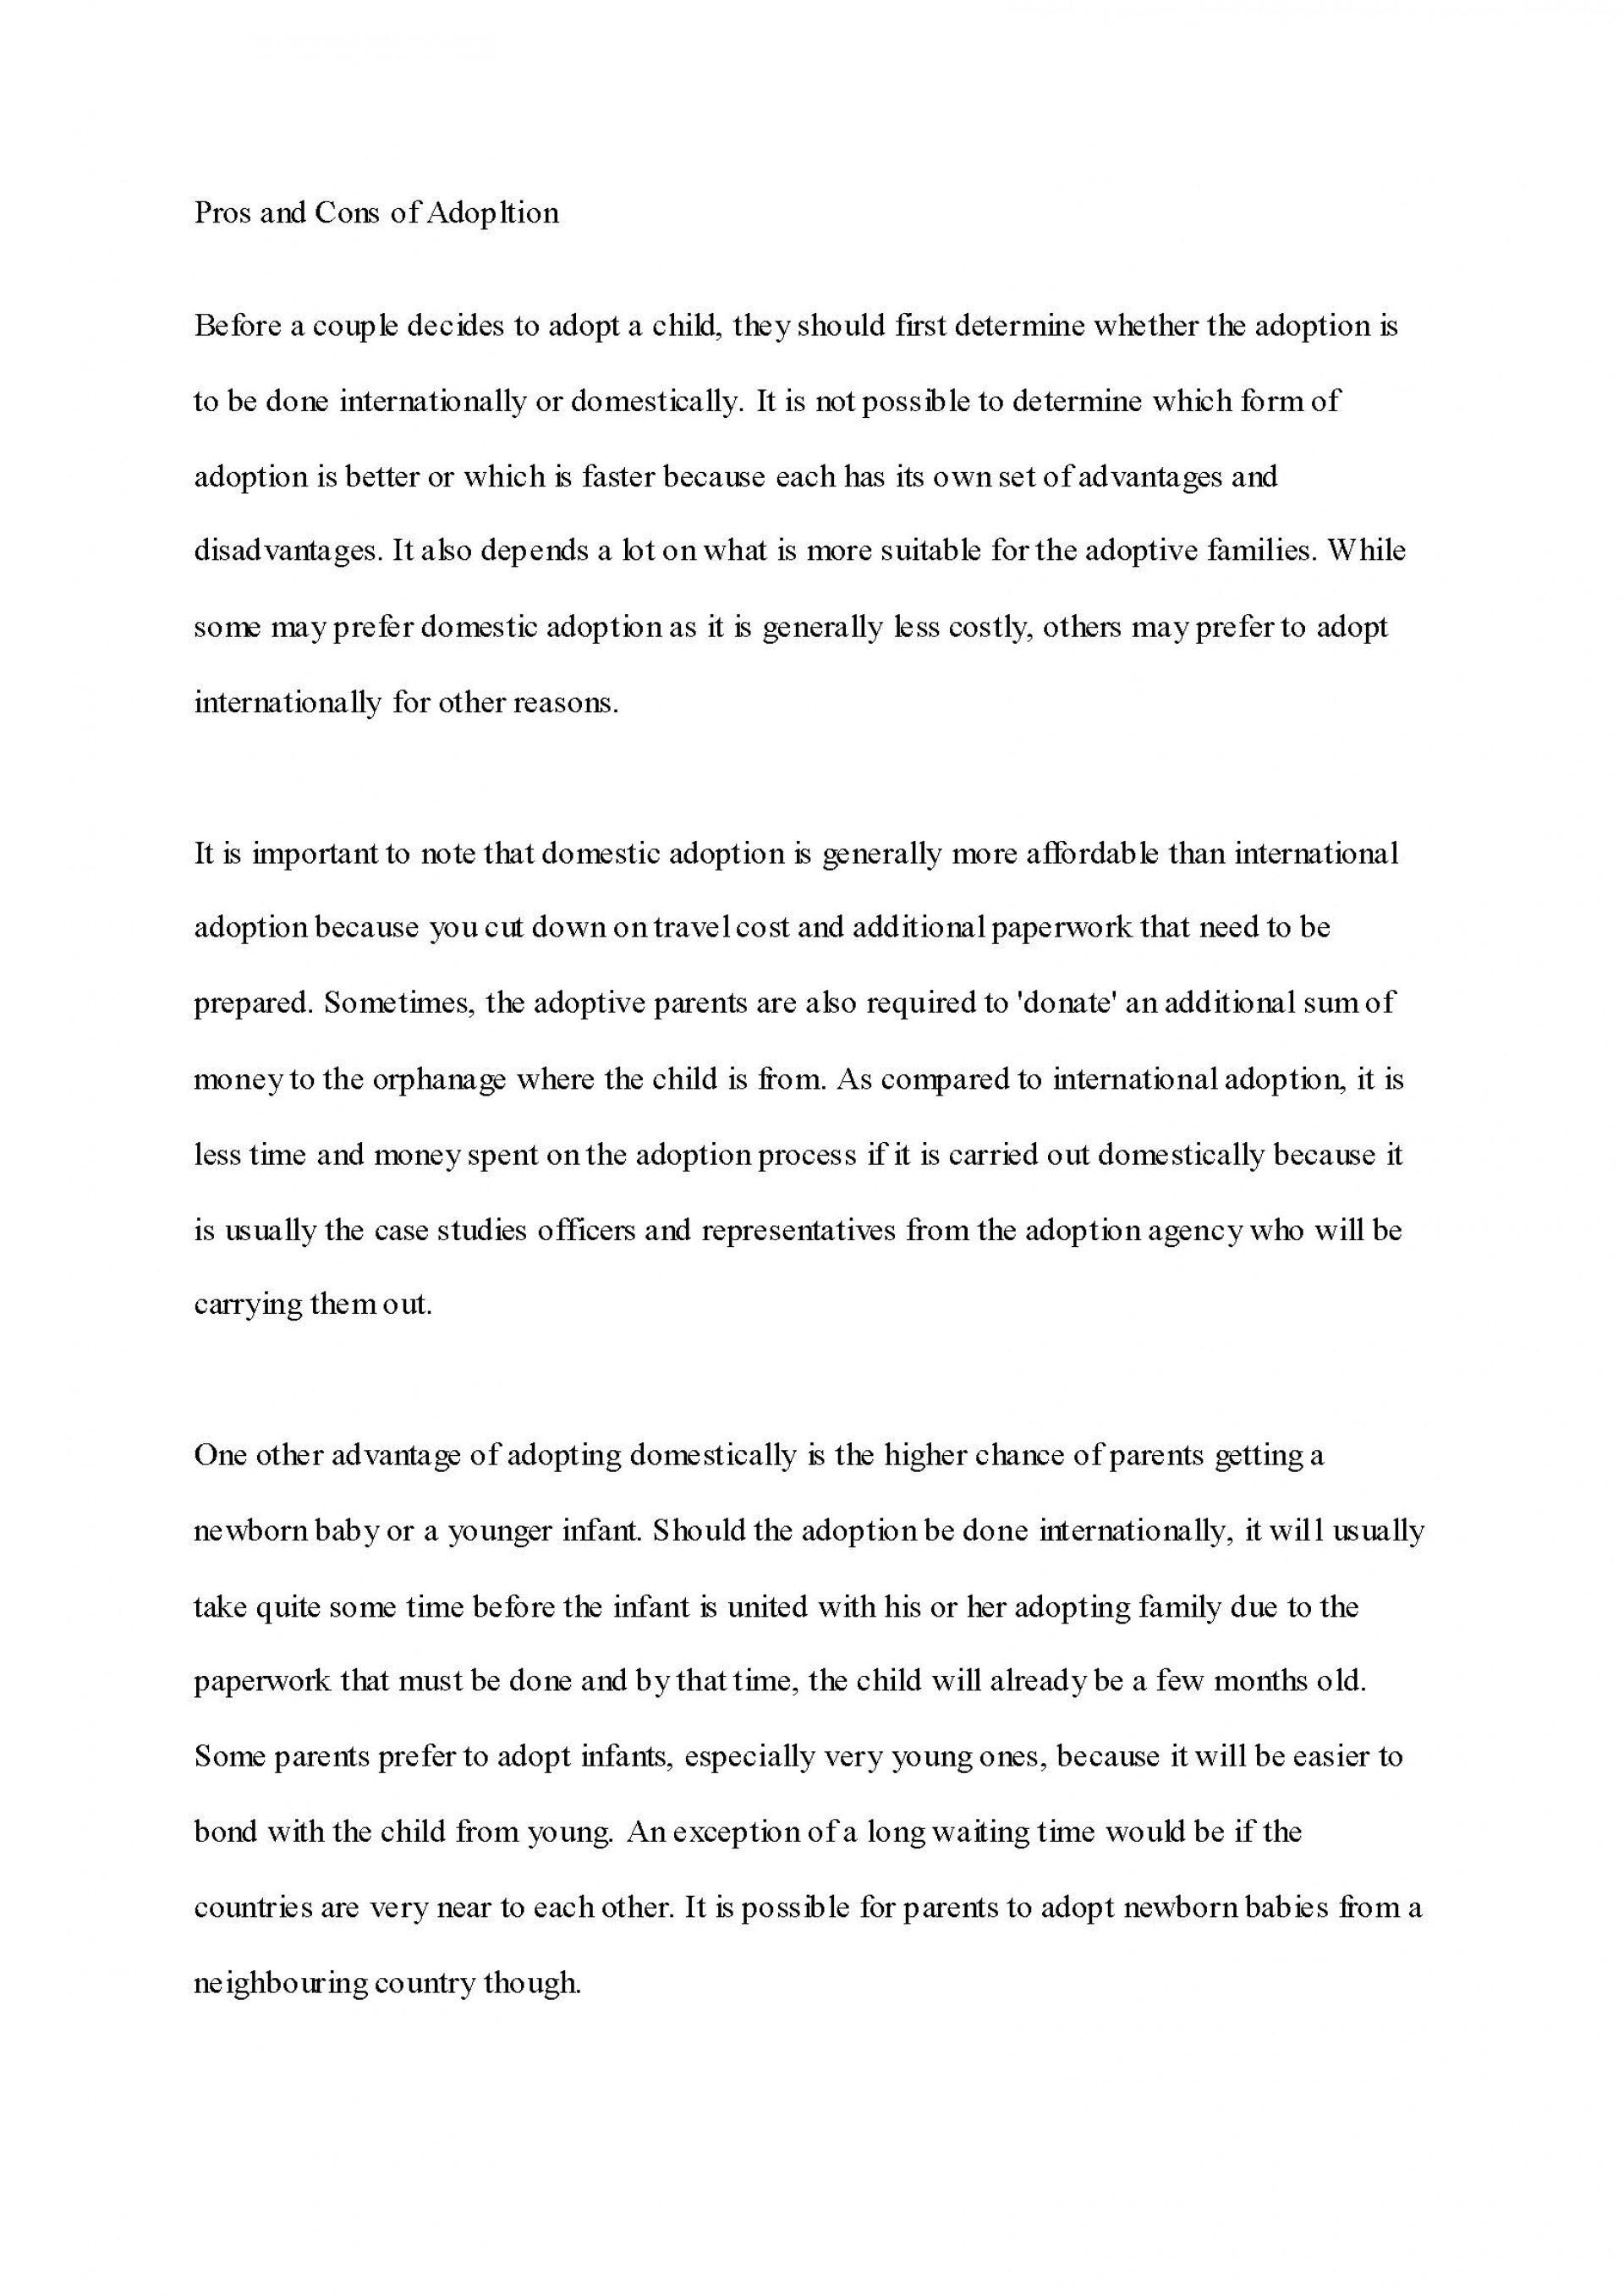 005 Respect Essay To Copy Example Adoption Surprising 1920